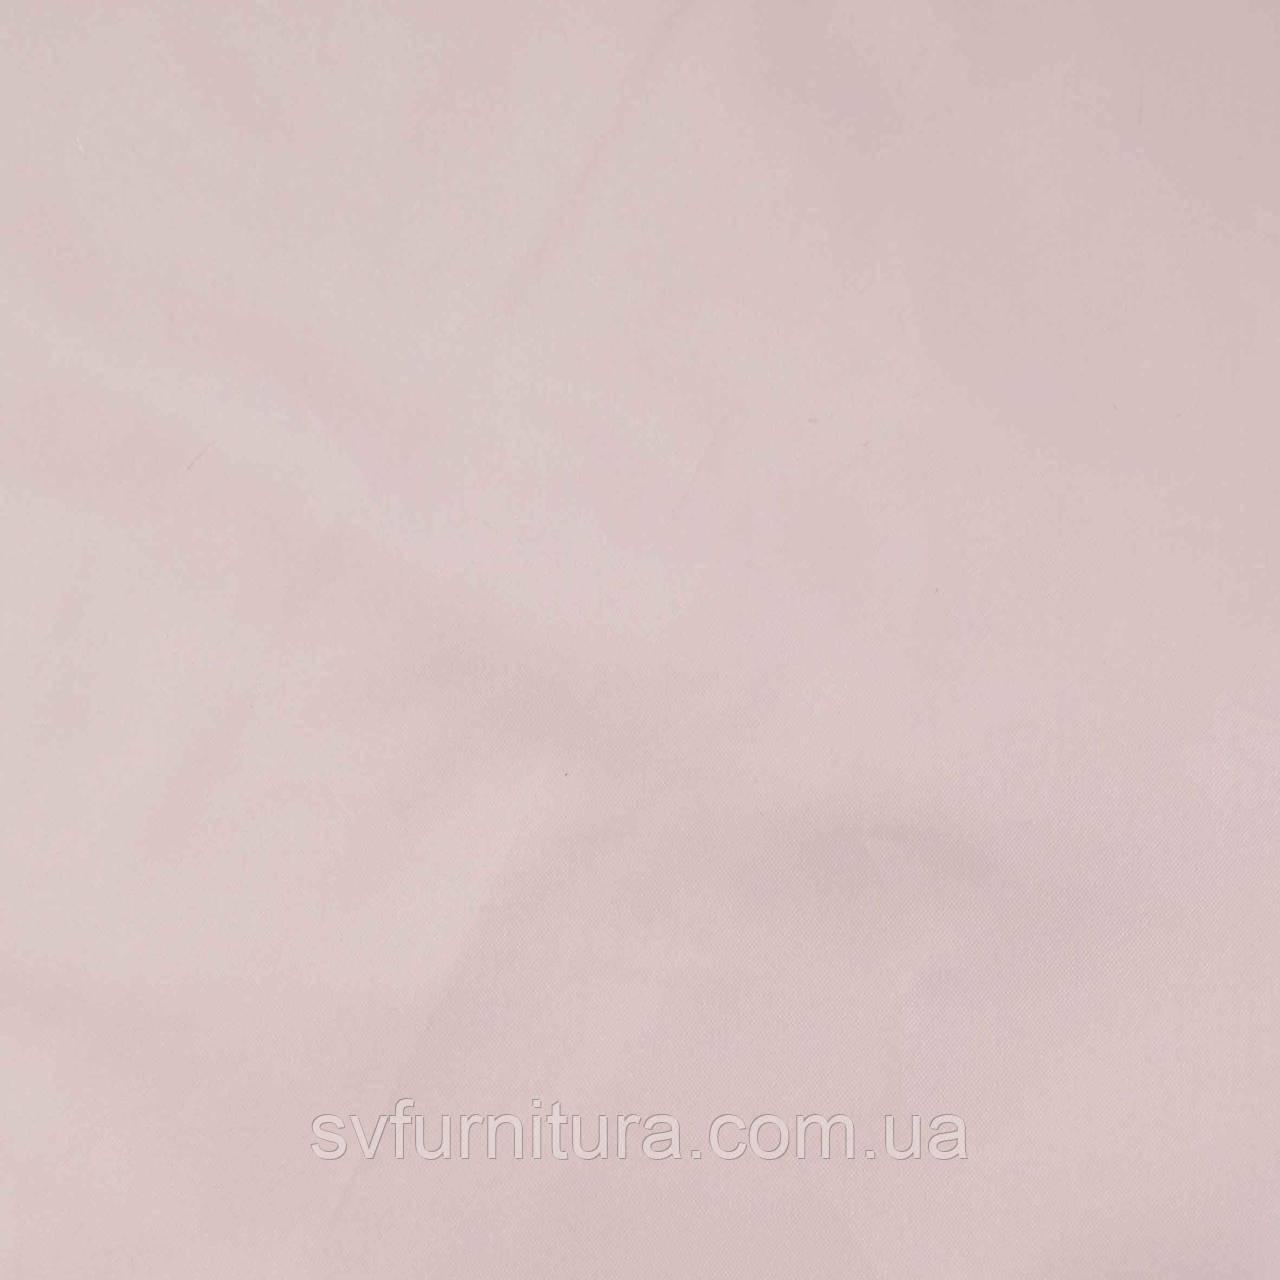 Ткань плащевка AА1 2020 13